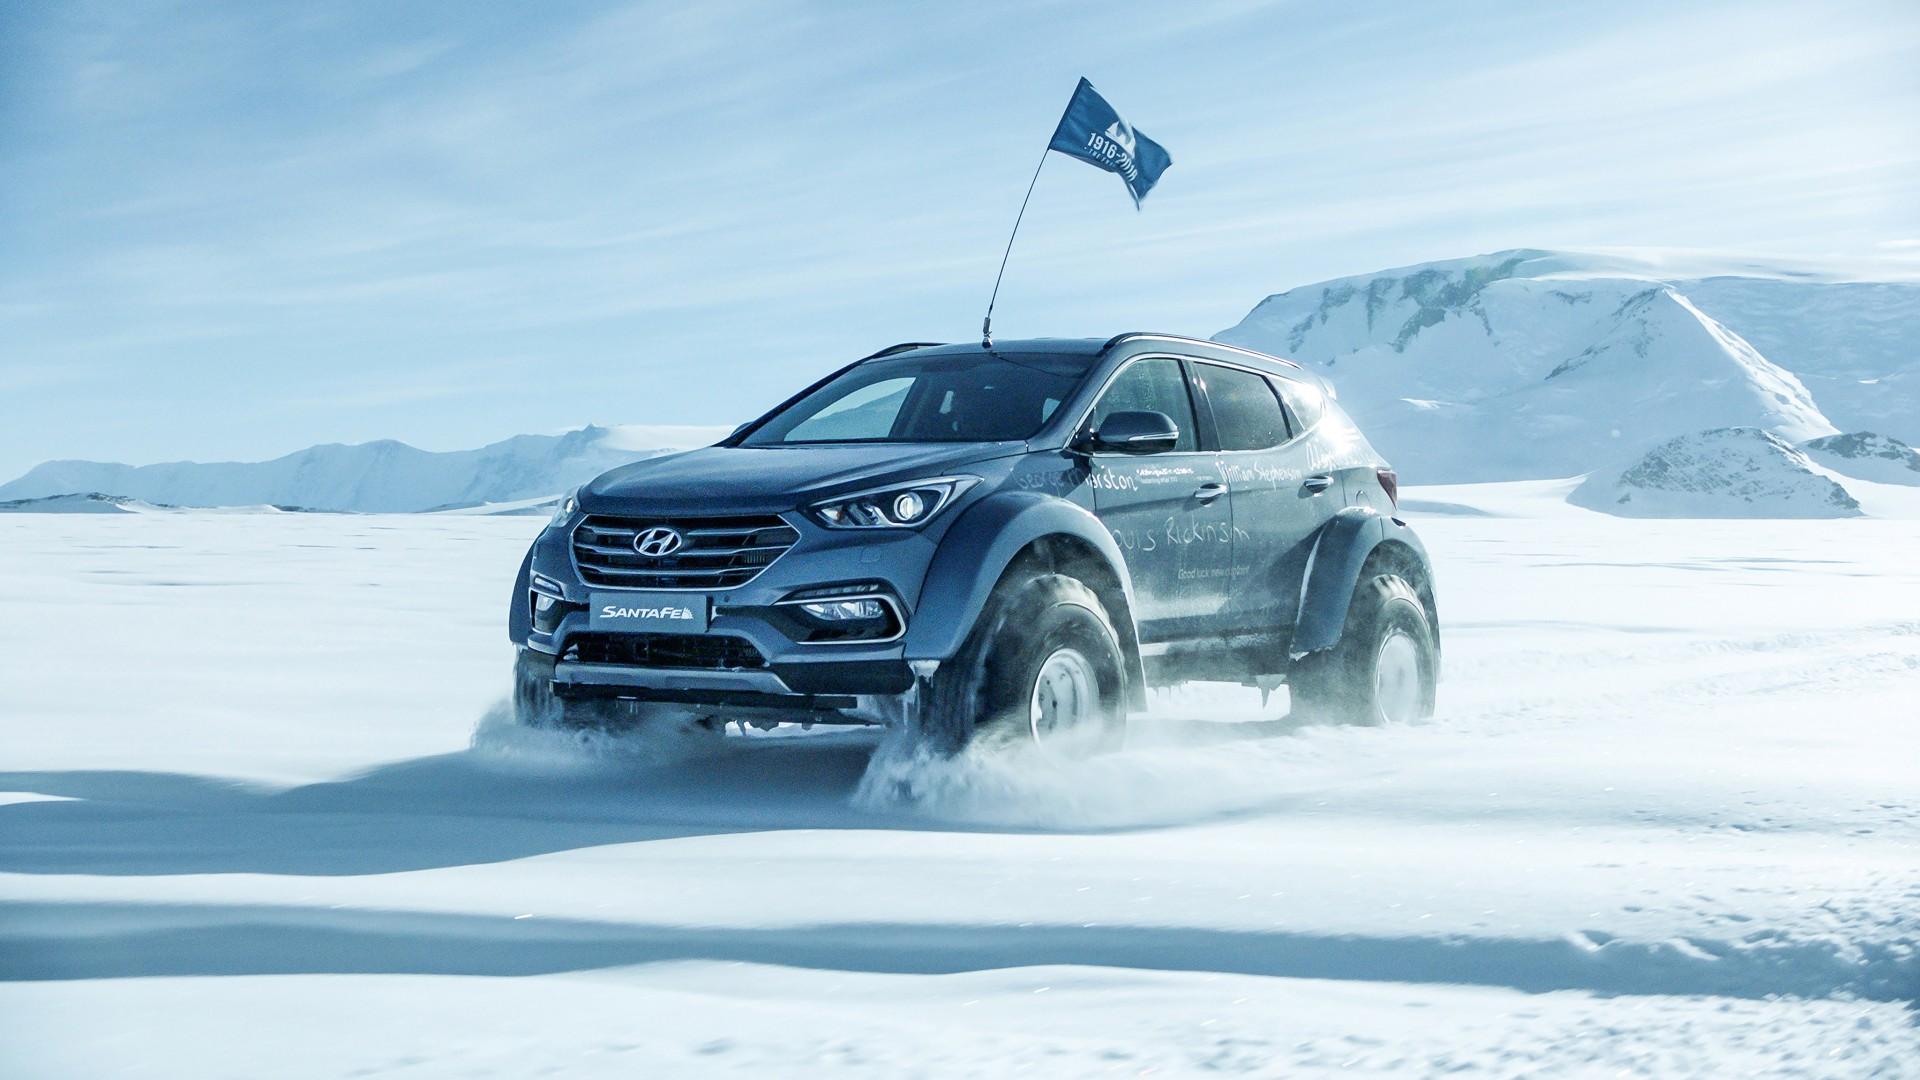 Lower trims get cloth seats with heated seats from the sel trim. 2017 Arctic Trucks Hyundai Santa Fe Wallpaper | HD Car